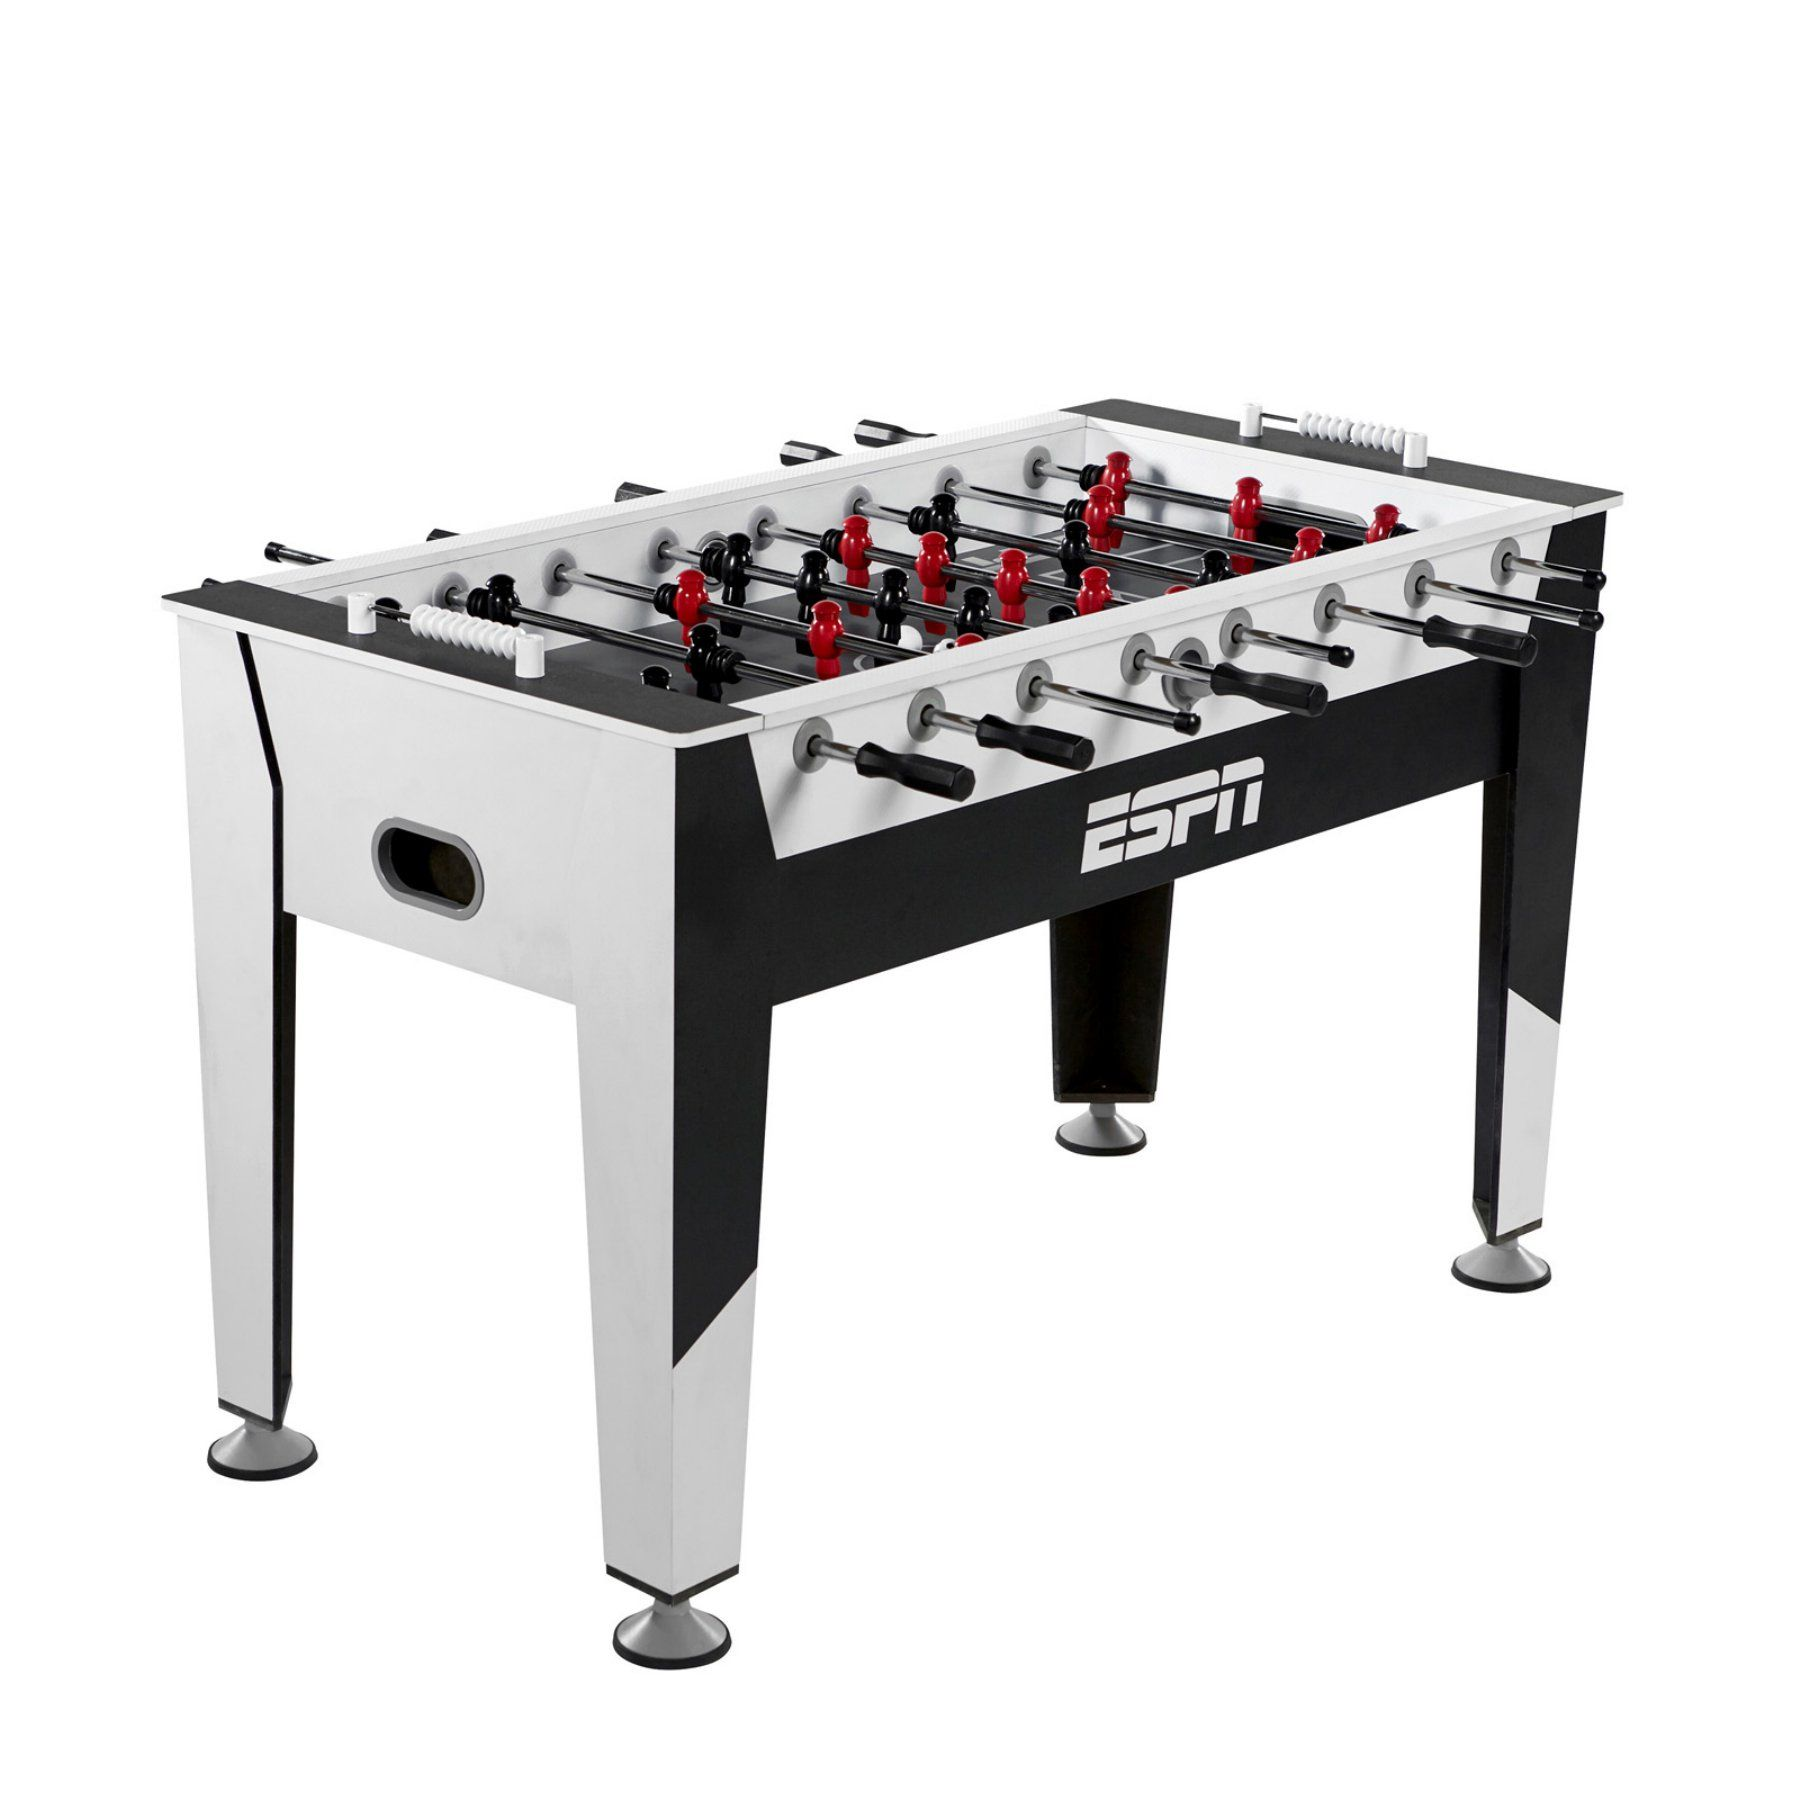 Espn 54 In Foosball Table Foosball Table Game Room Furniture